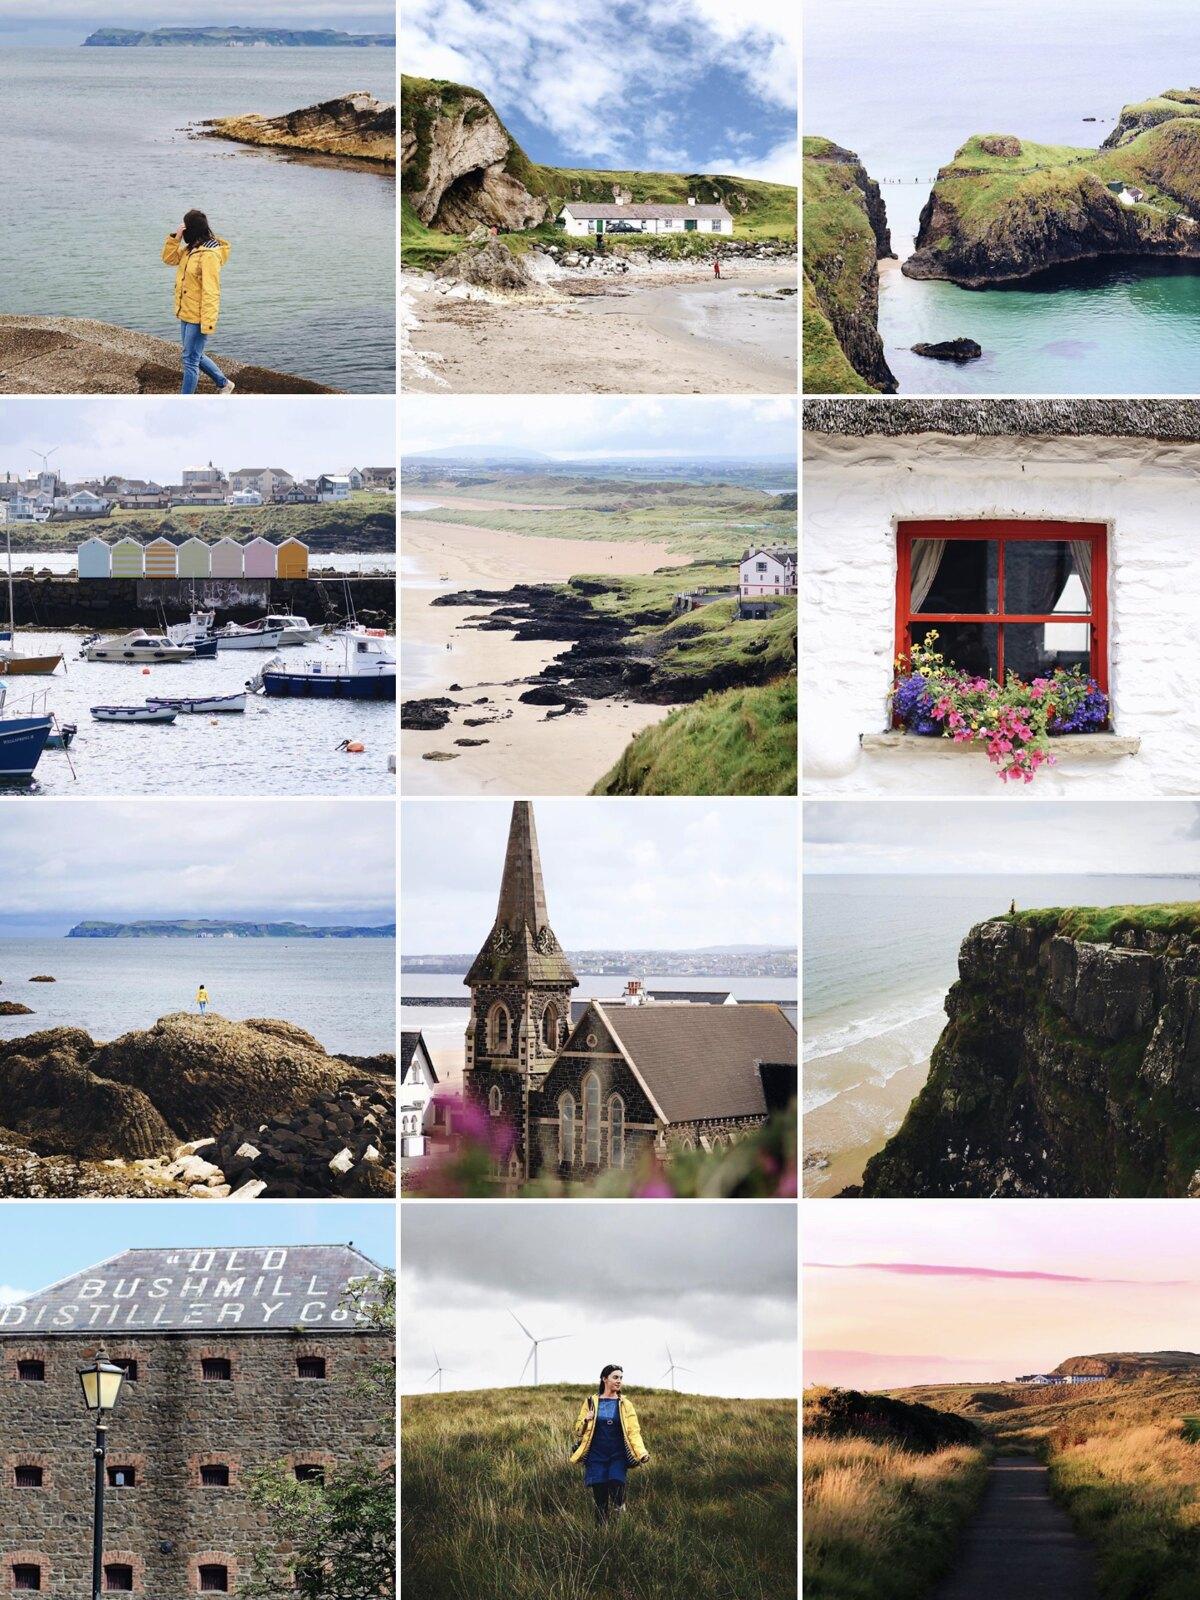 August in Instagram photos 2017